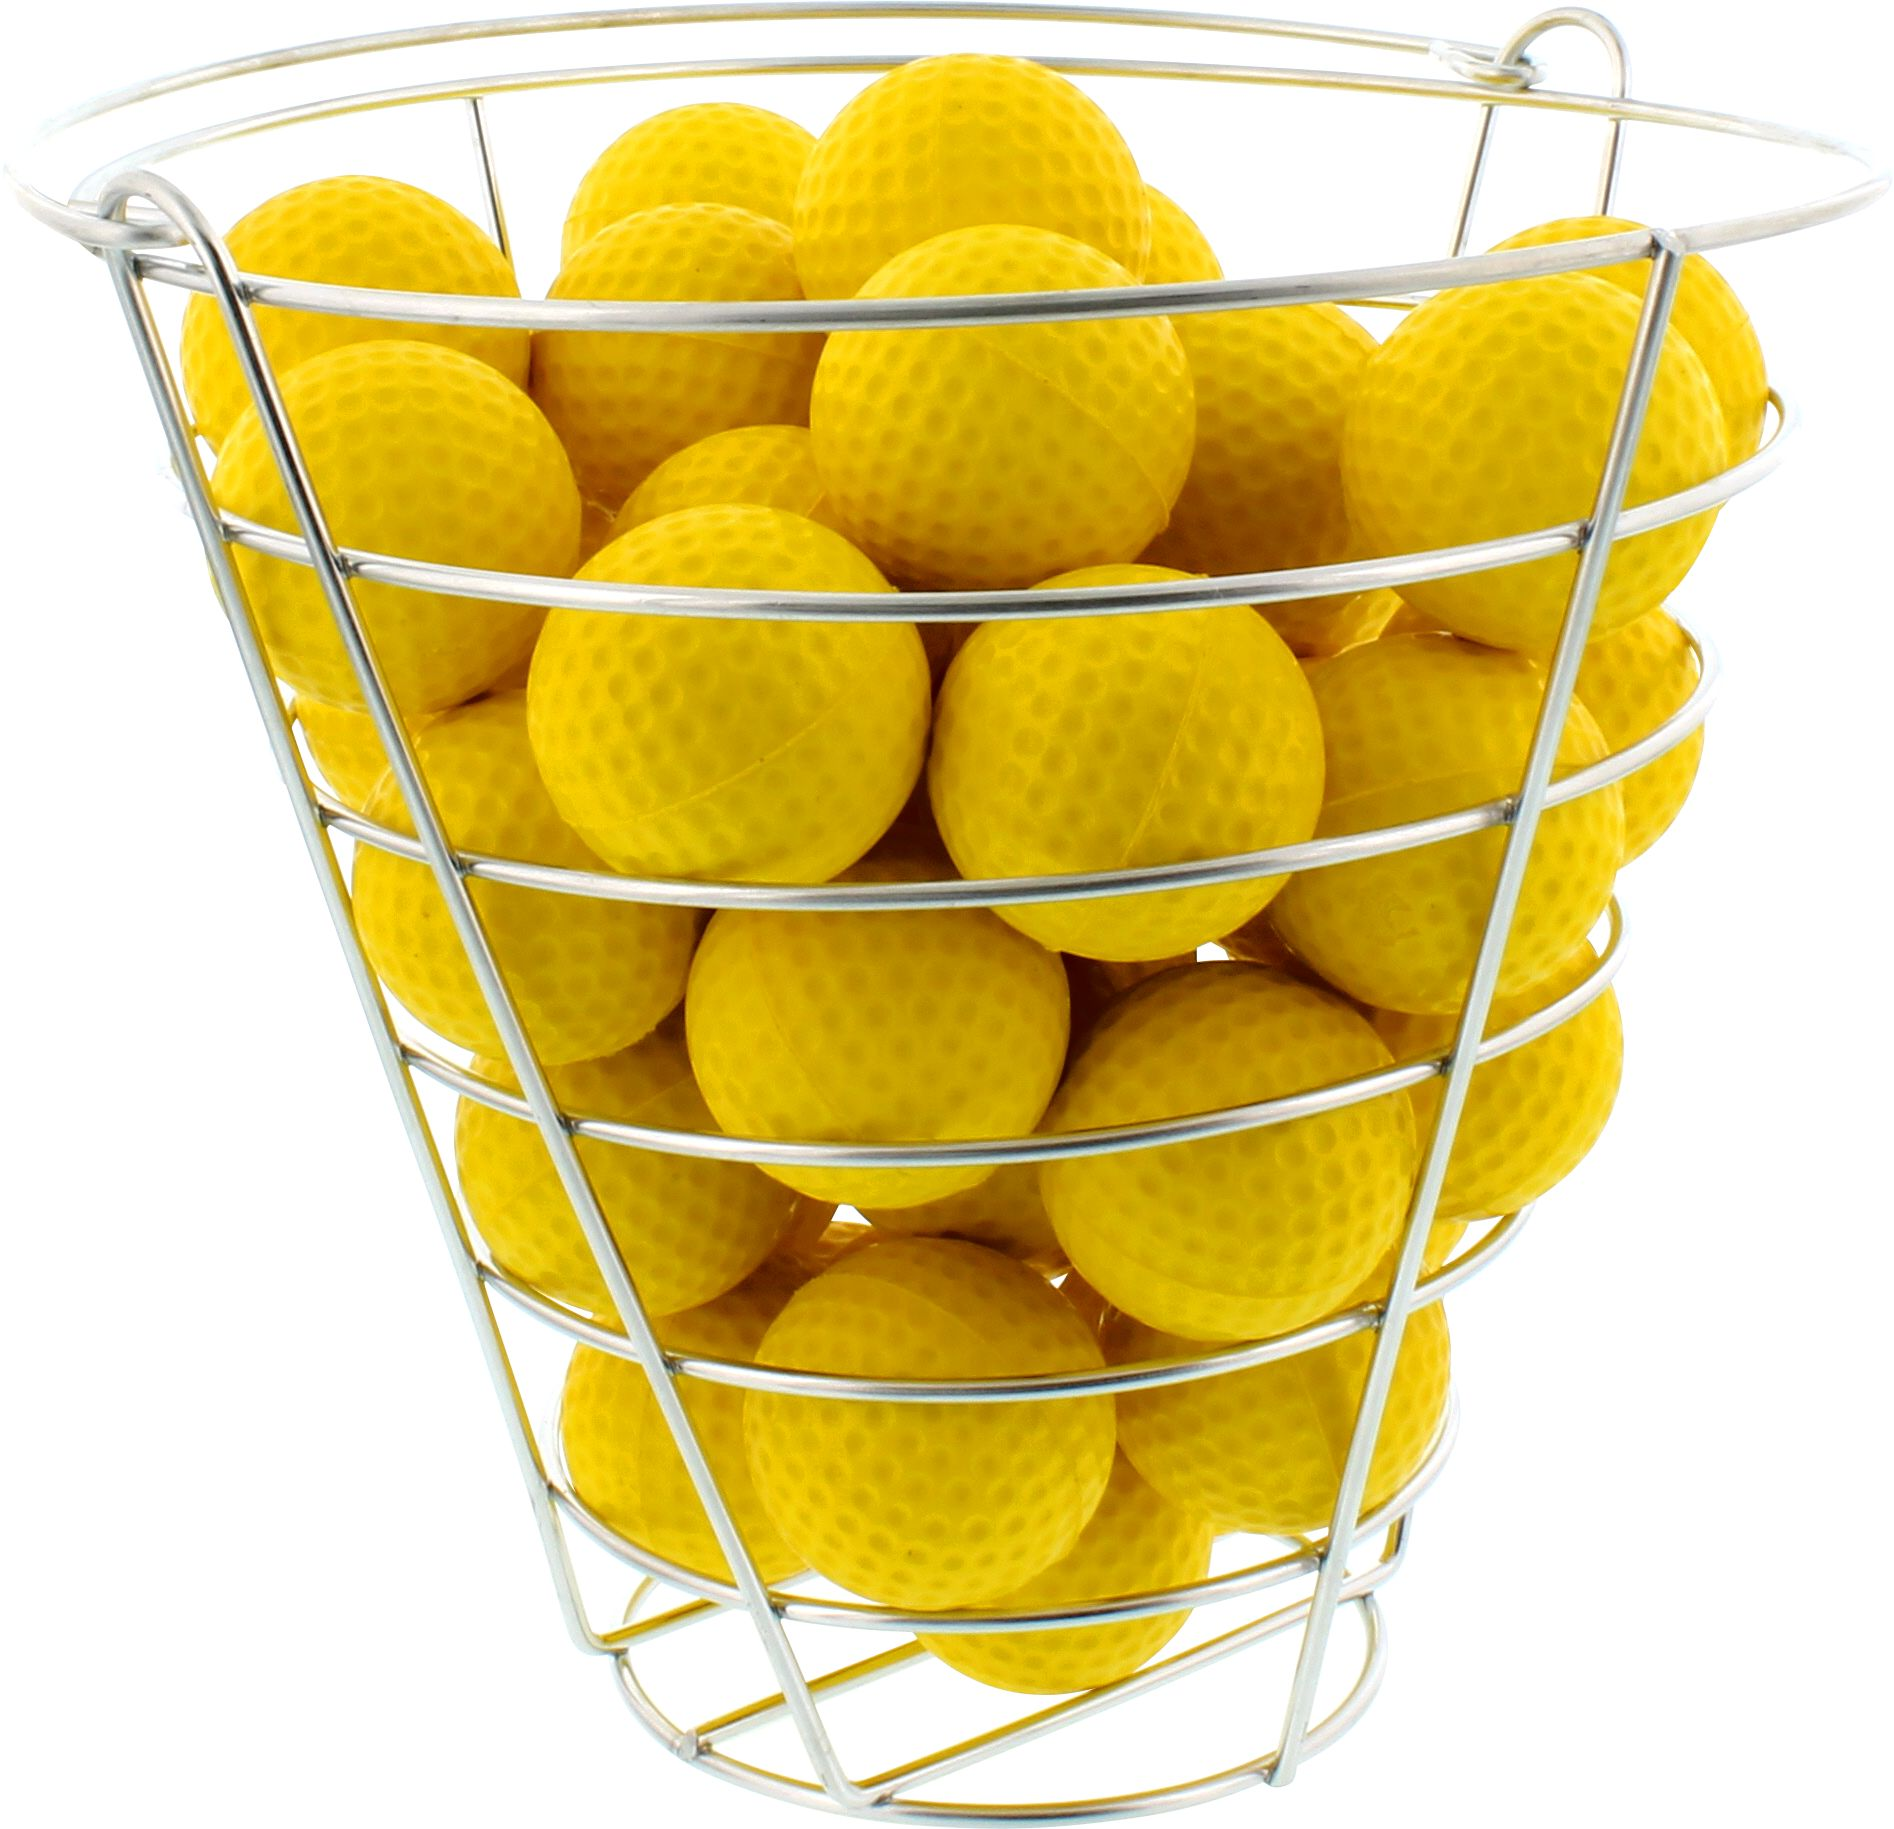 maxfli foam balls u0026 practice basket u2013 42pack